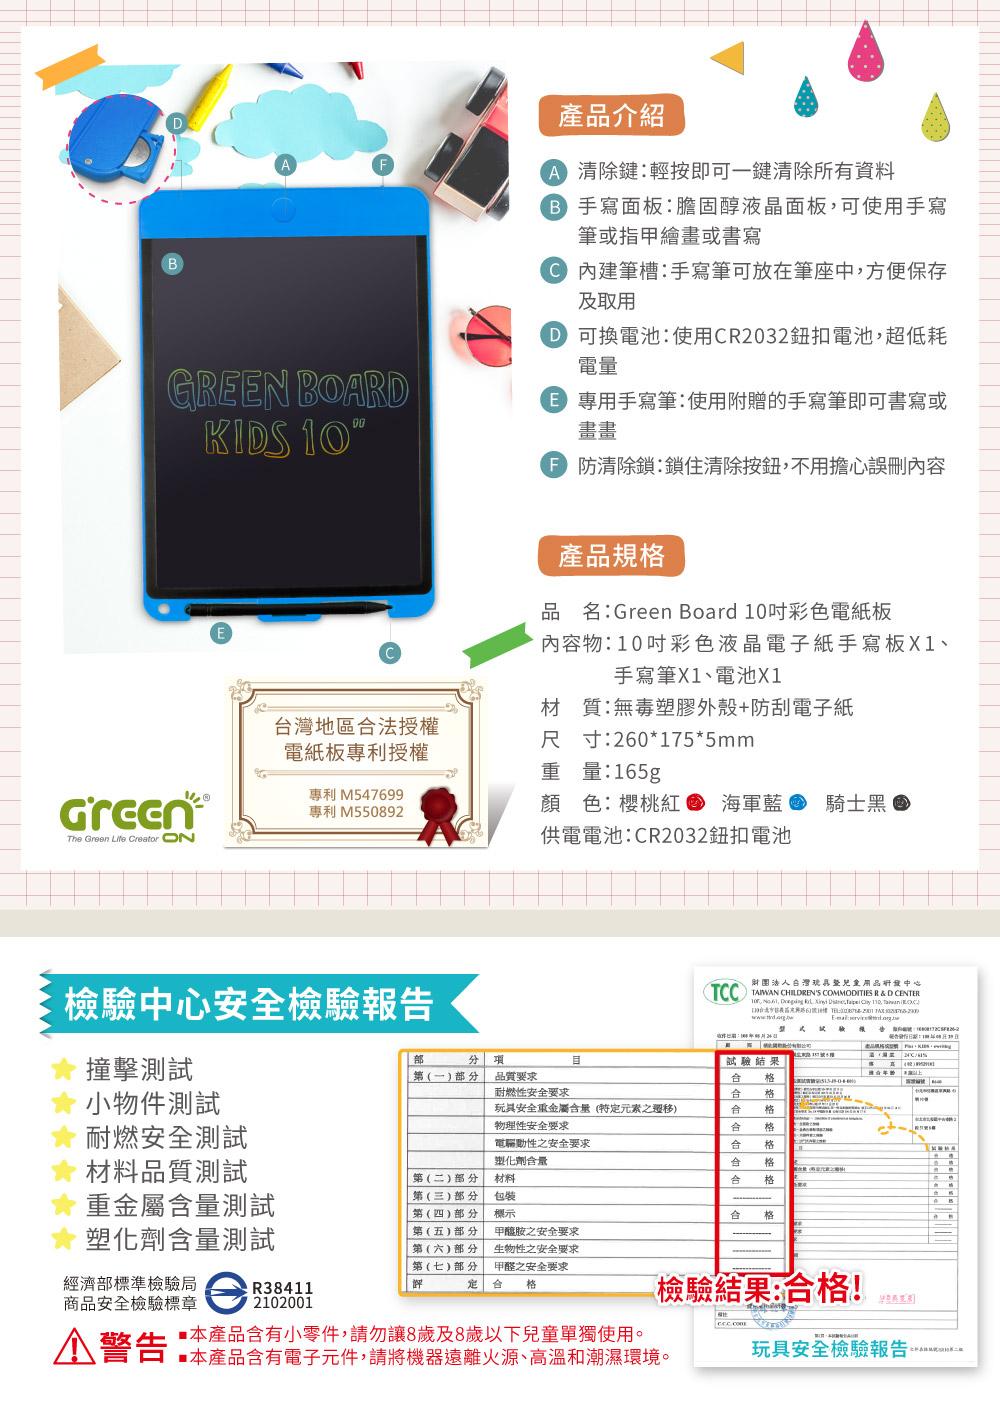 Green Board KIDS 10吋彩色電紙板 電子紙手寫板 學習教具 溝通輔具